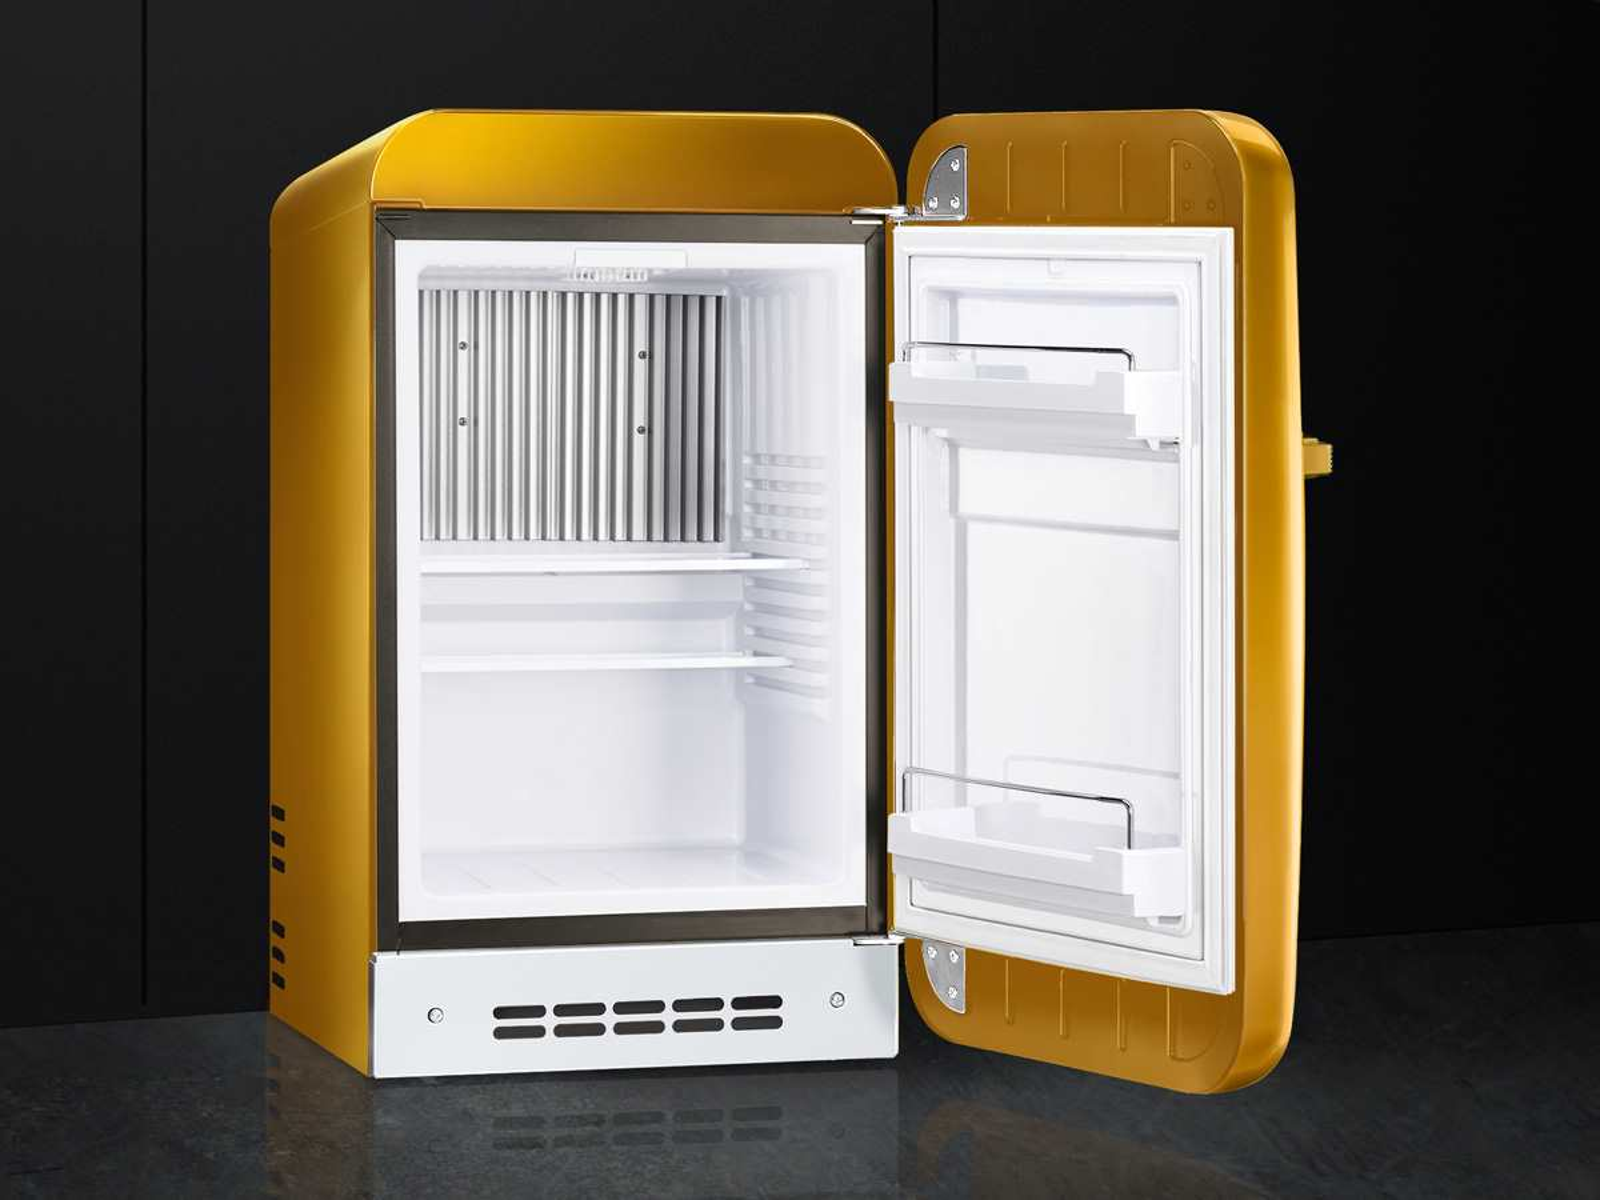 Smeg Kühlschrank Kaufen : Smeg fab5rgo standkühlschrank gold swarowski